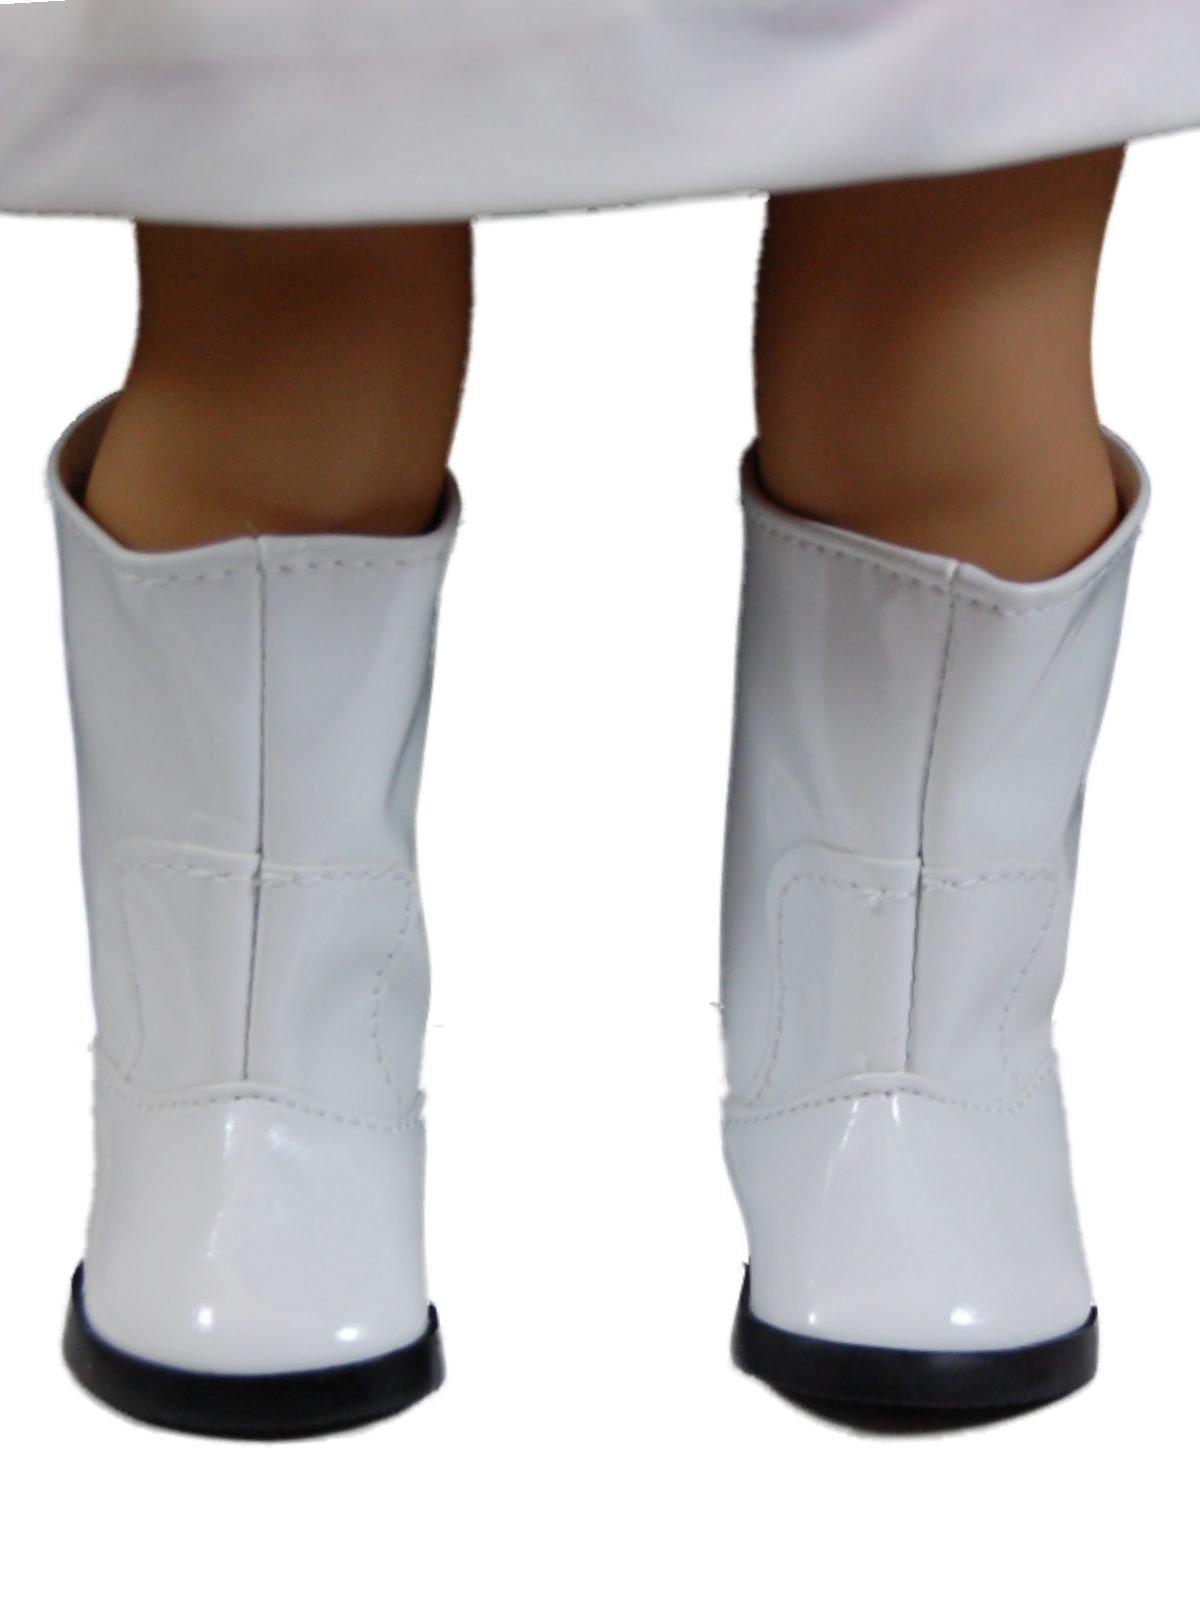 ffda3d17da63c White Go Go Boots Shoes Fit 18